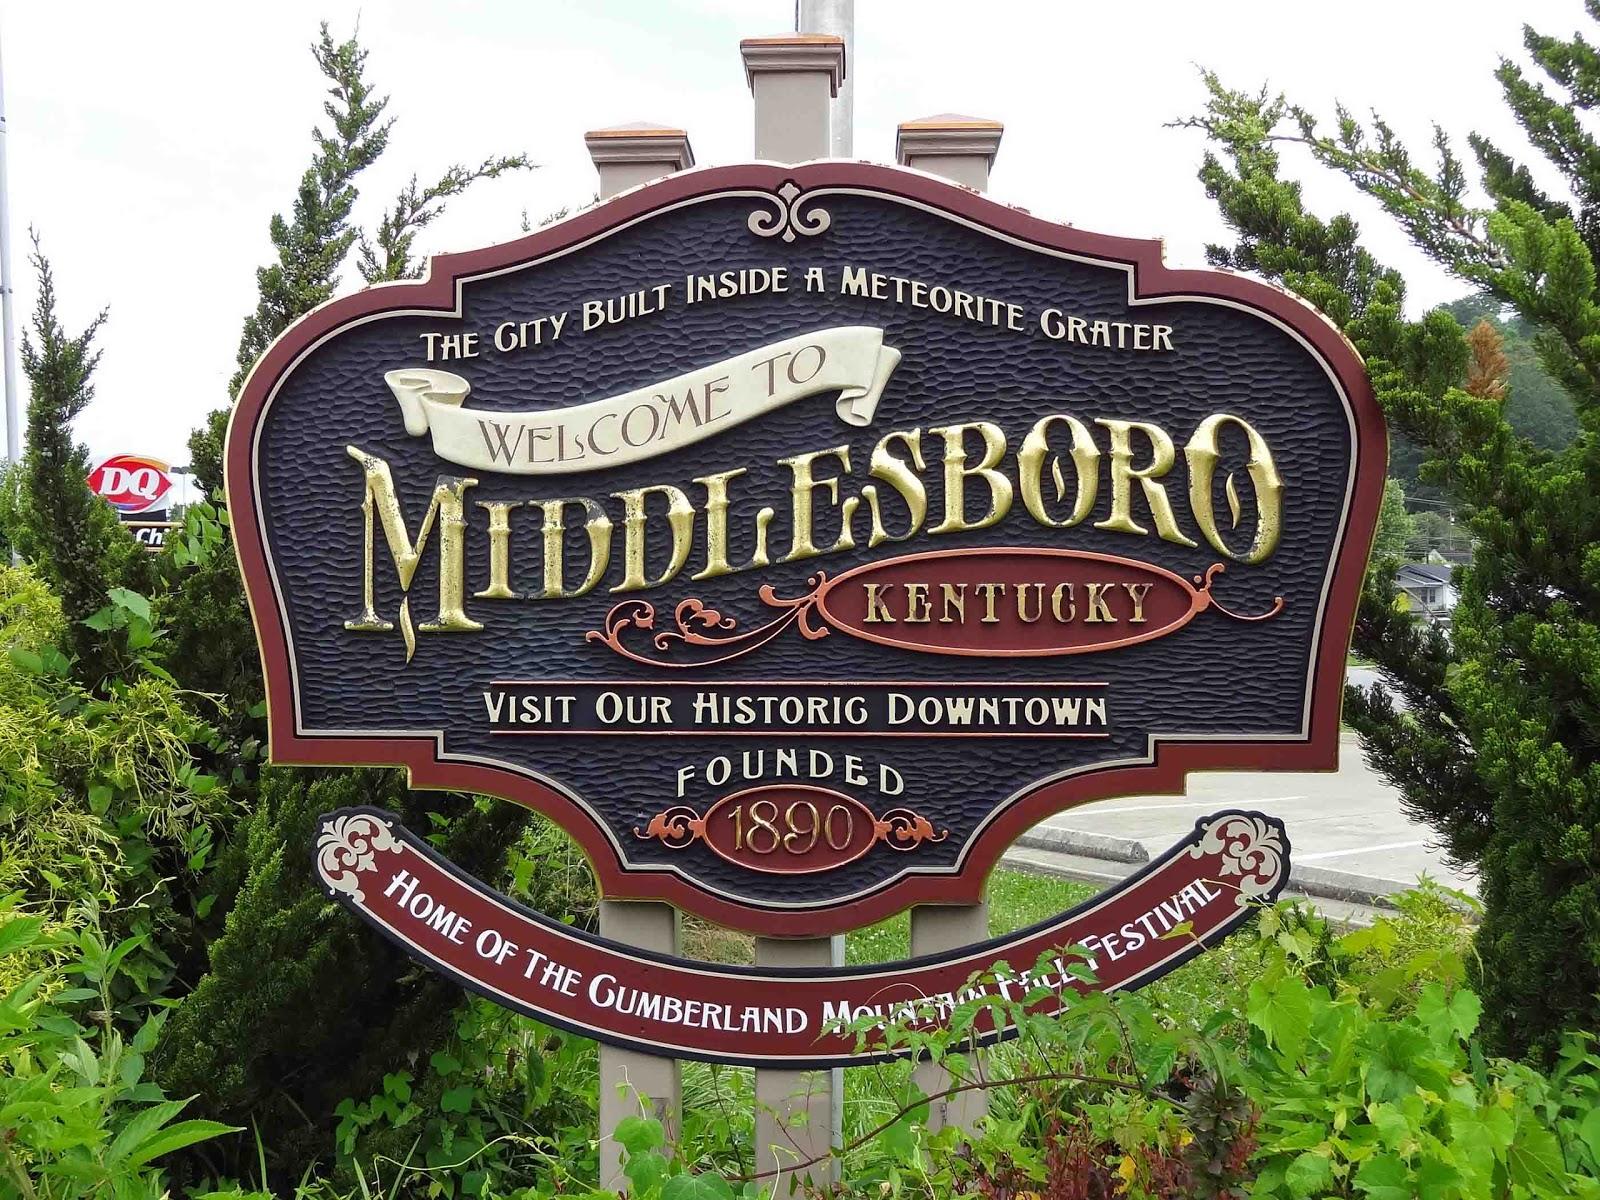 Middlesboro (KY) United States  city photos : ... OLD KENTUCKY HOME | Pinterest | Kentucky, England Uk and United States